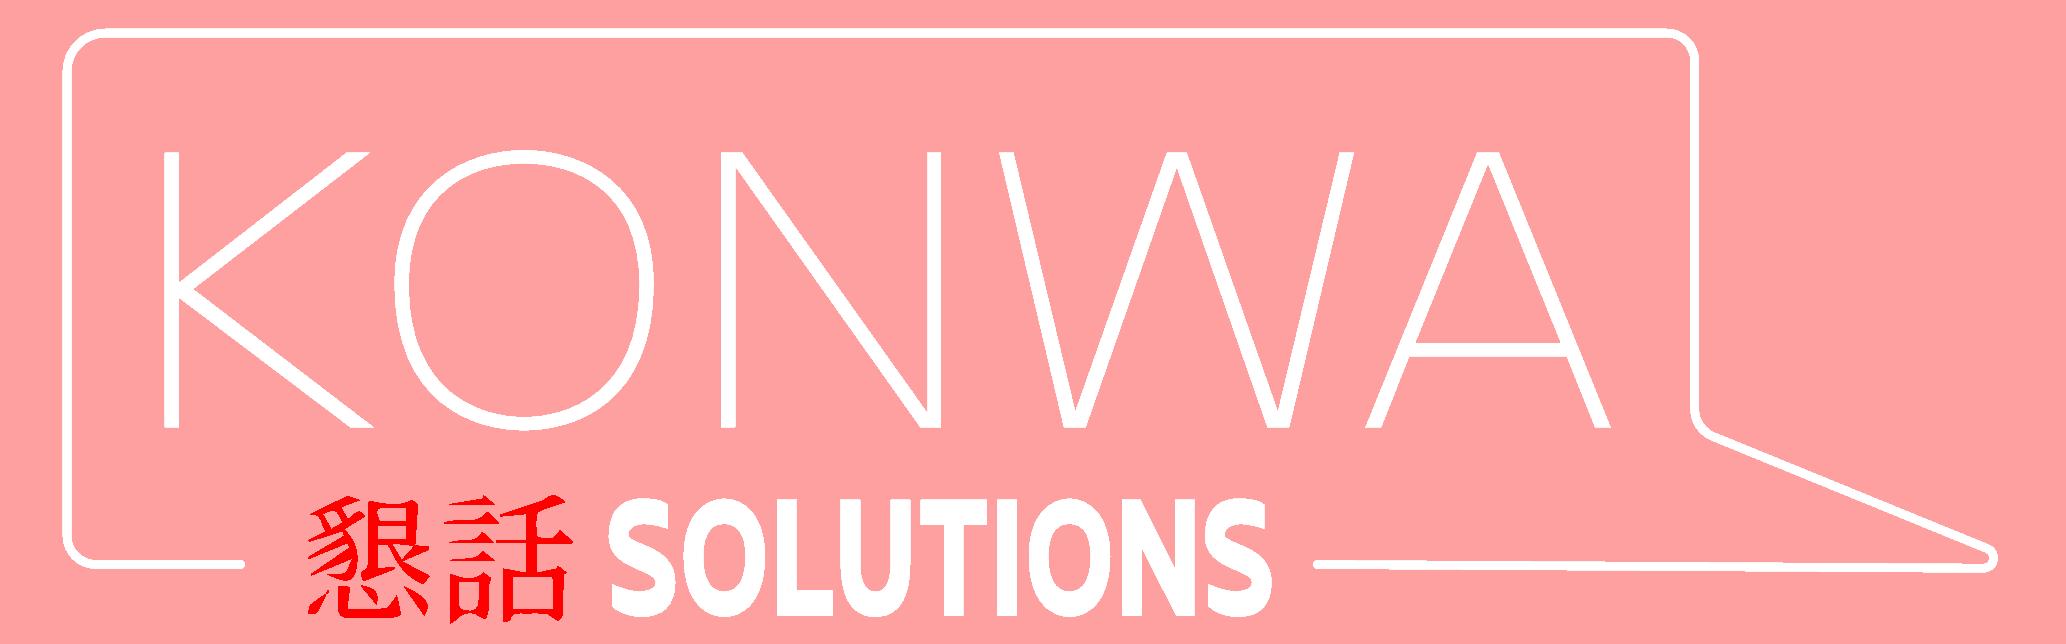 Konwa-Solutions